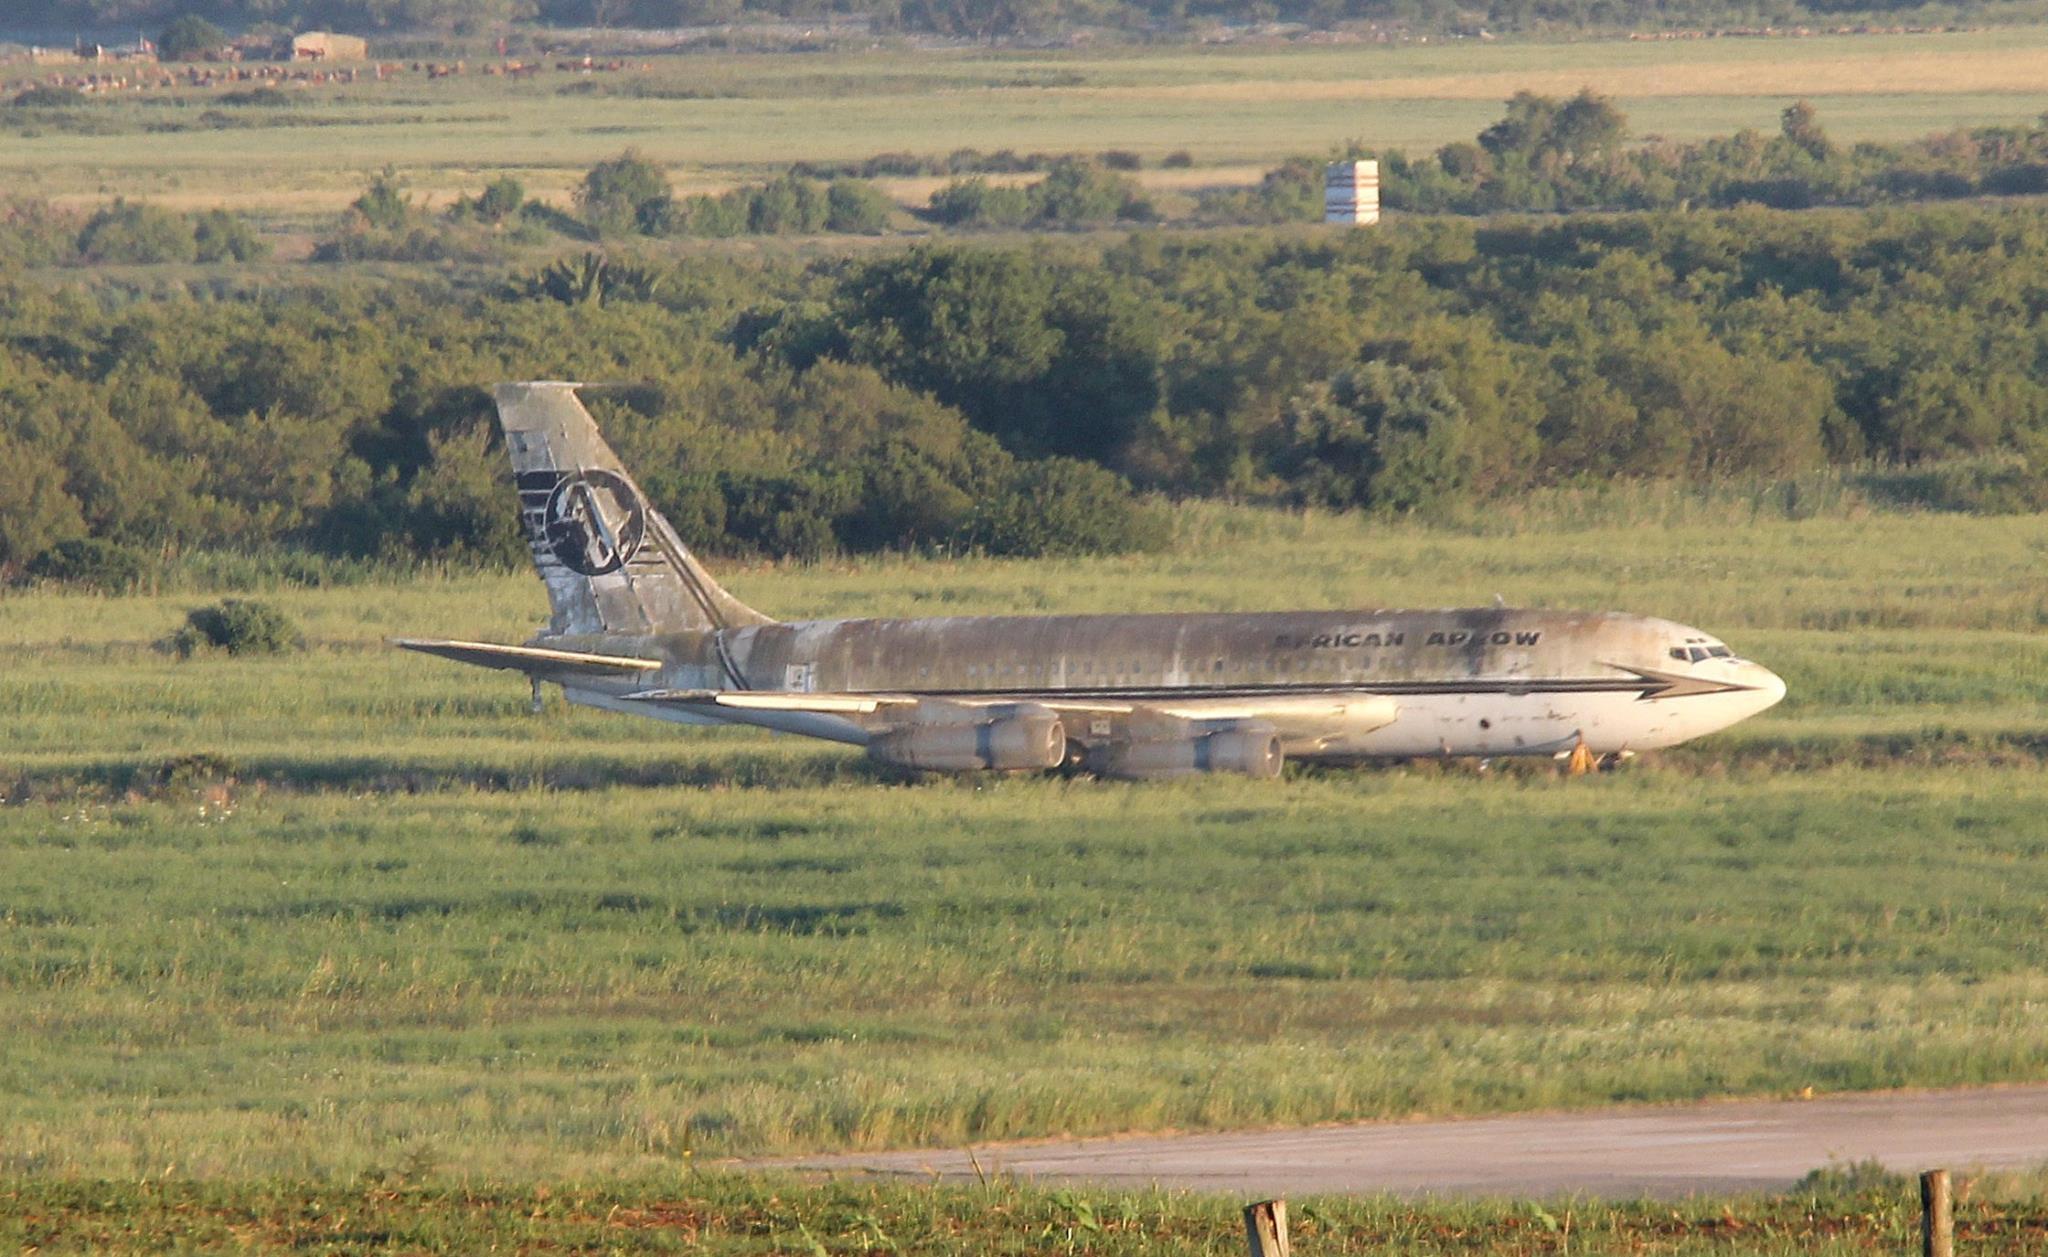 FRA: Photos anciens avions des FRA - Page 14 50802030143_3107a11174_o_d